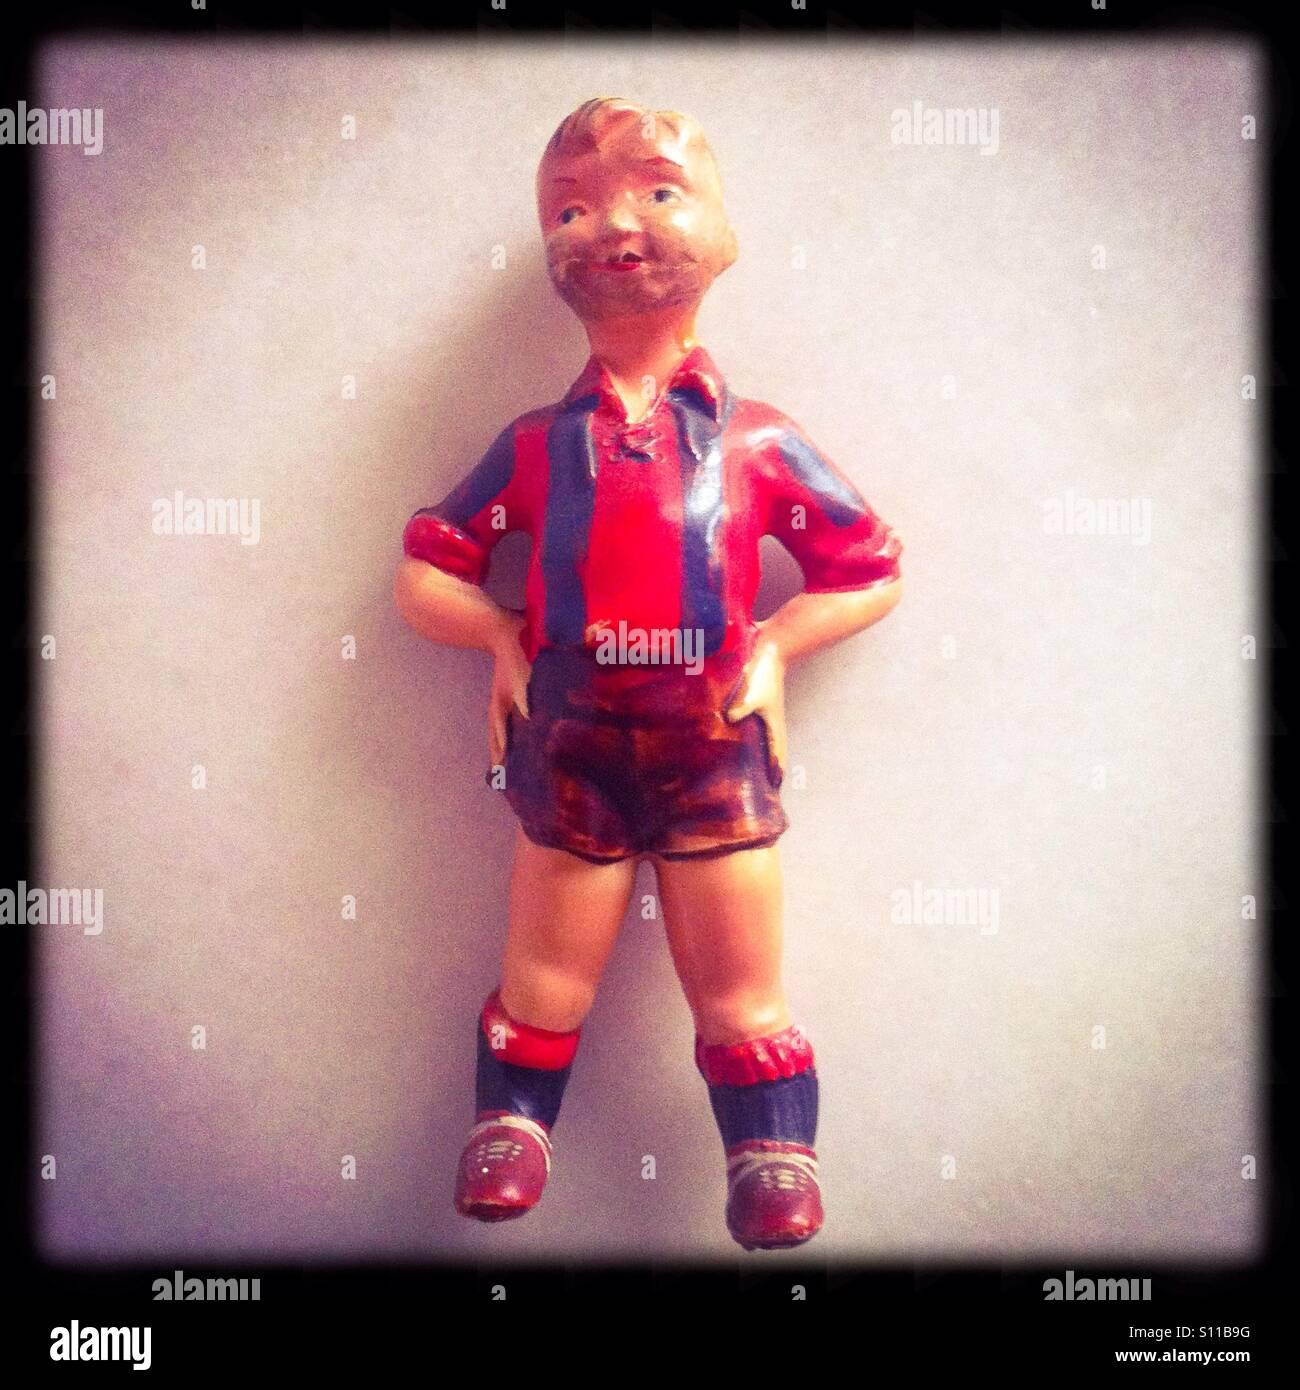 Dressed Puppet Imágenes De Stock & Dressed Puppet Fotos De Stock - Alamy